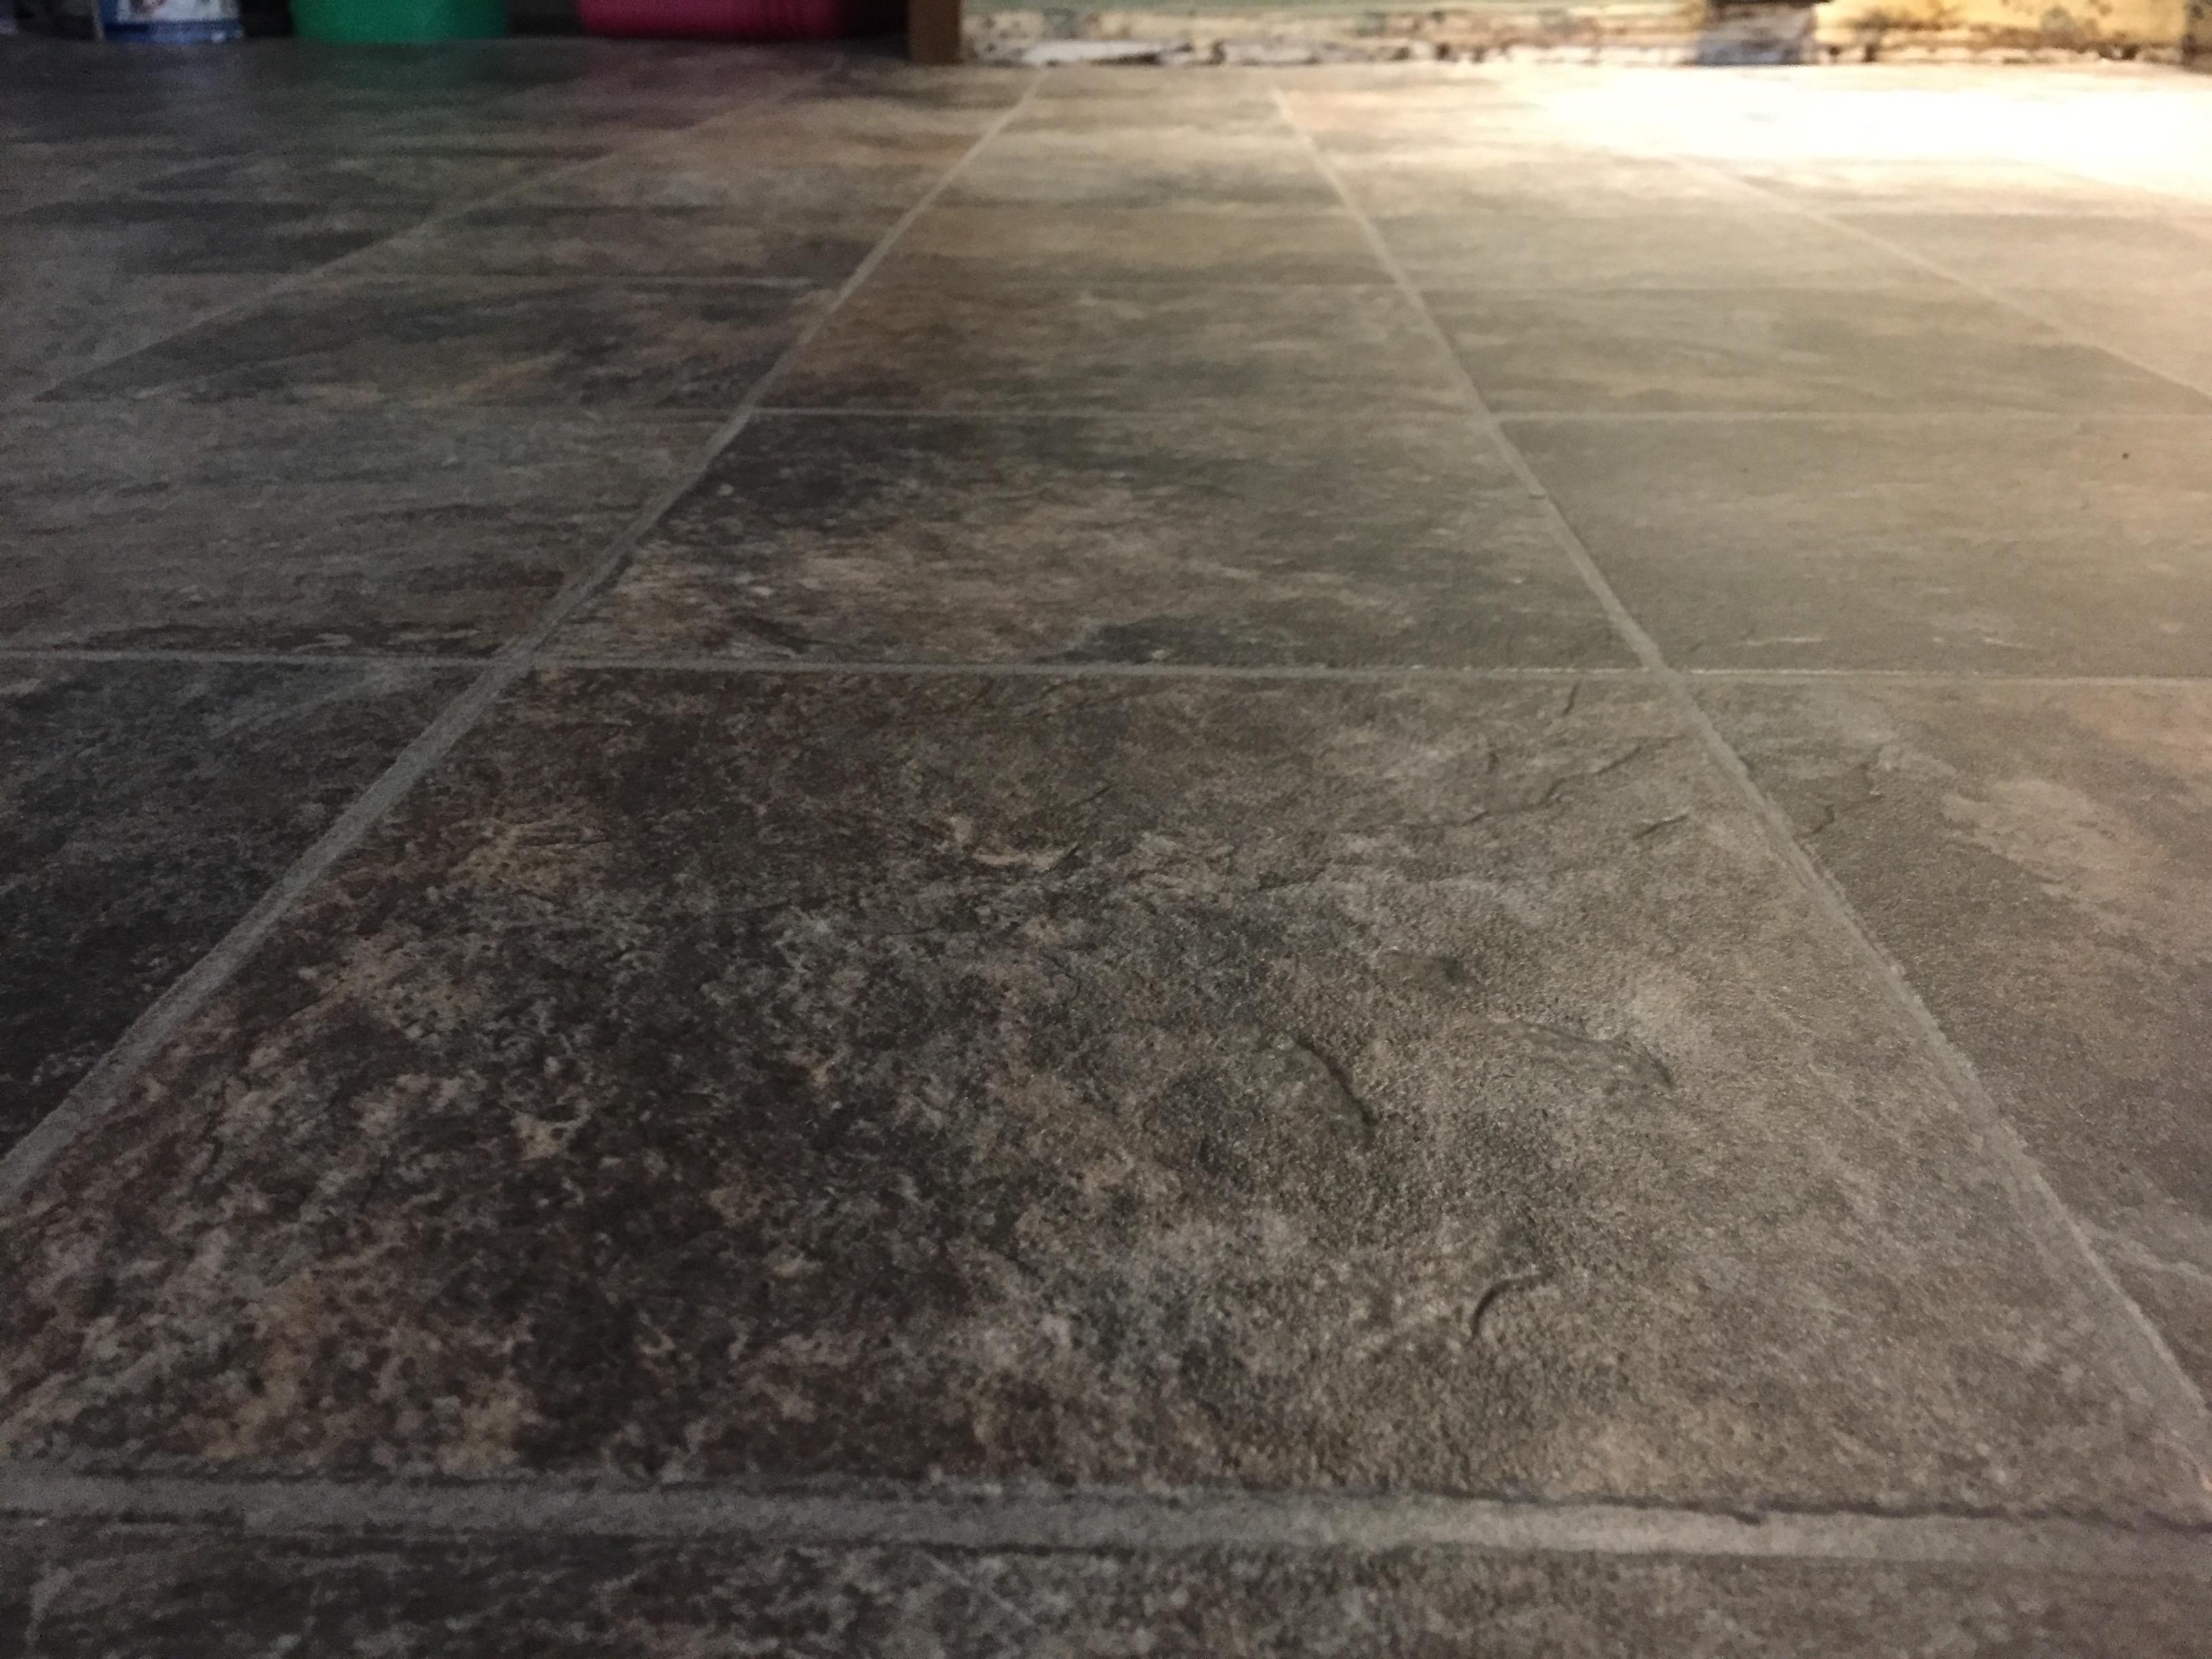 asp brian companyproductcollectionlist s ny floor inc laminate hd custom tarkett flooring elmira